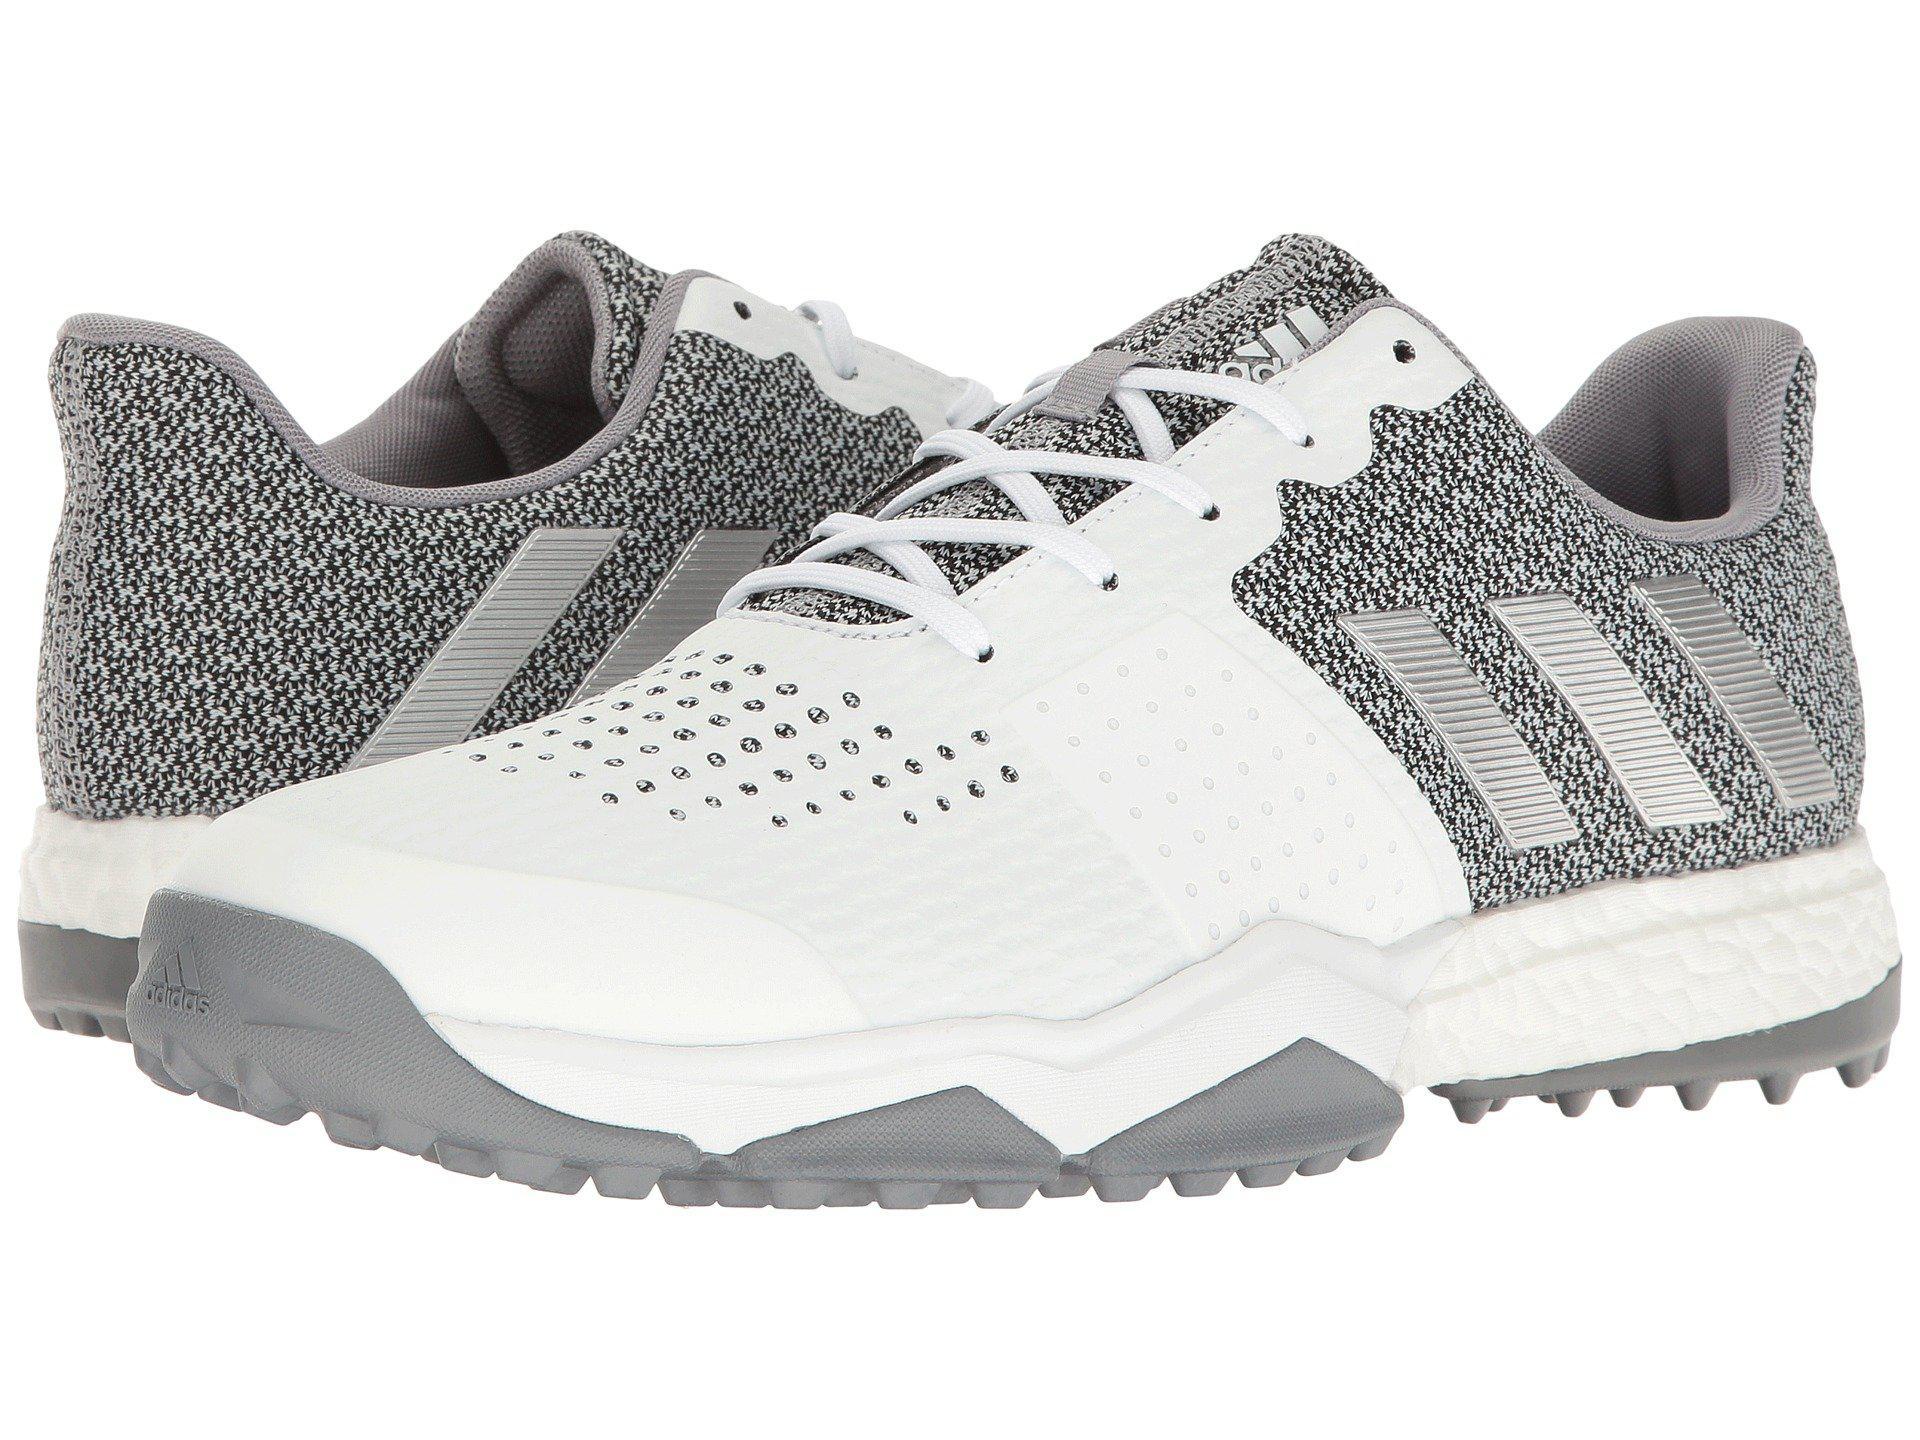 lyst adidas originali adipower l 'impulso 3 (calzature bianco / nero